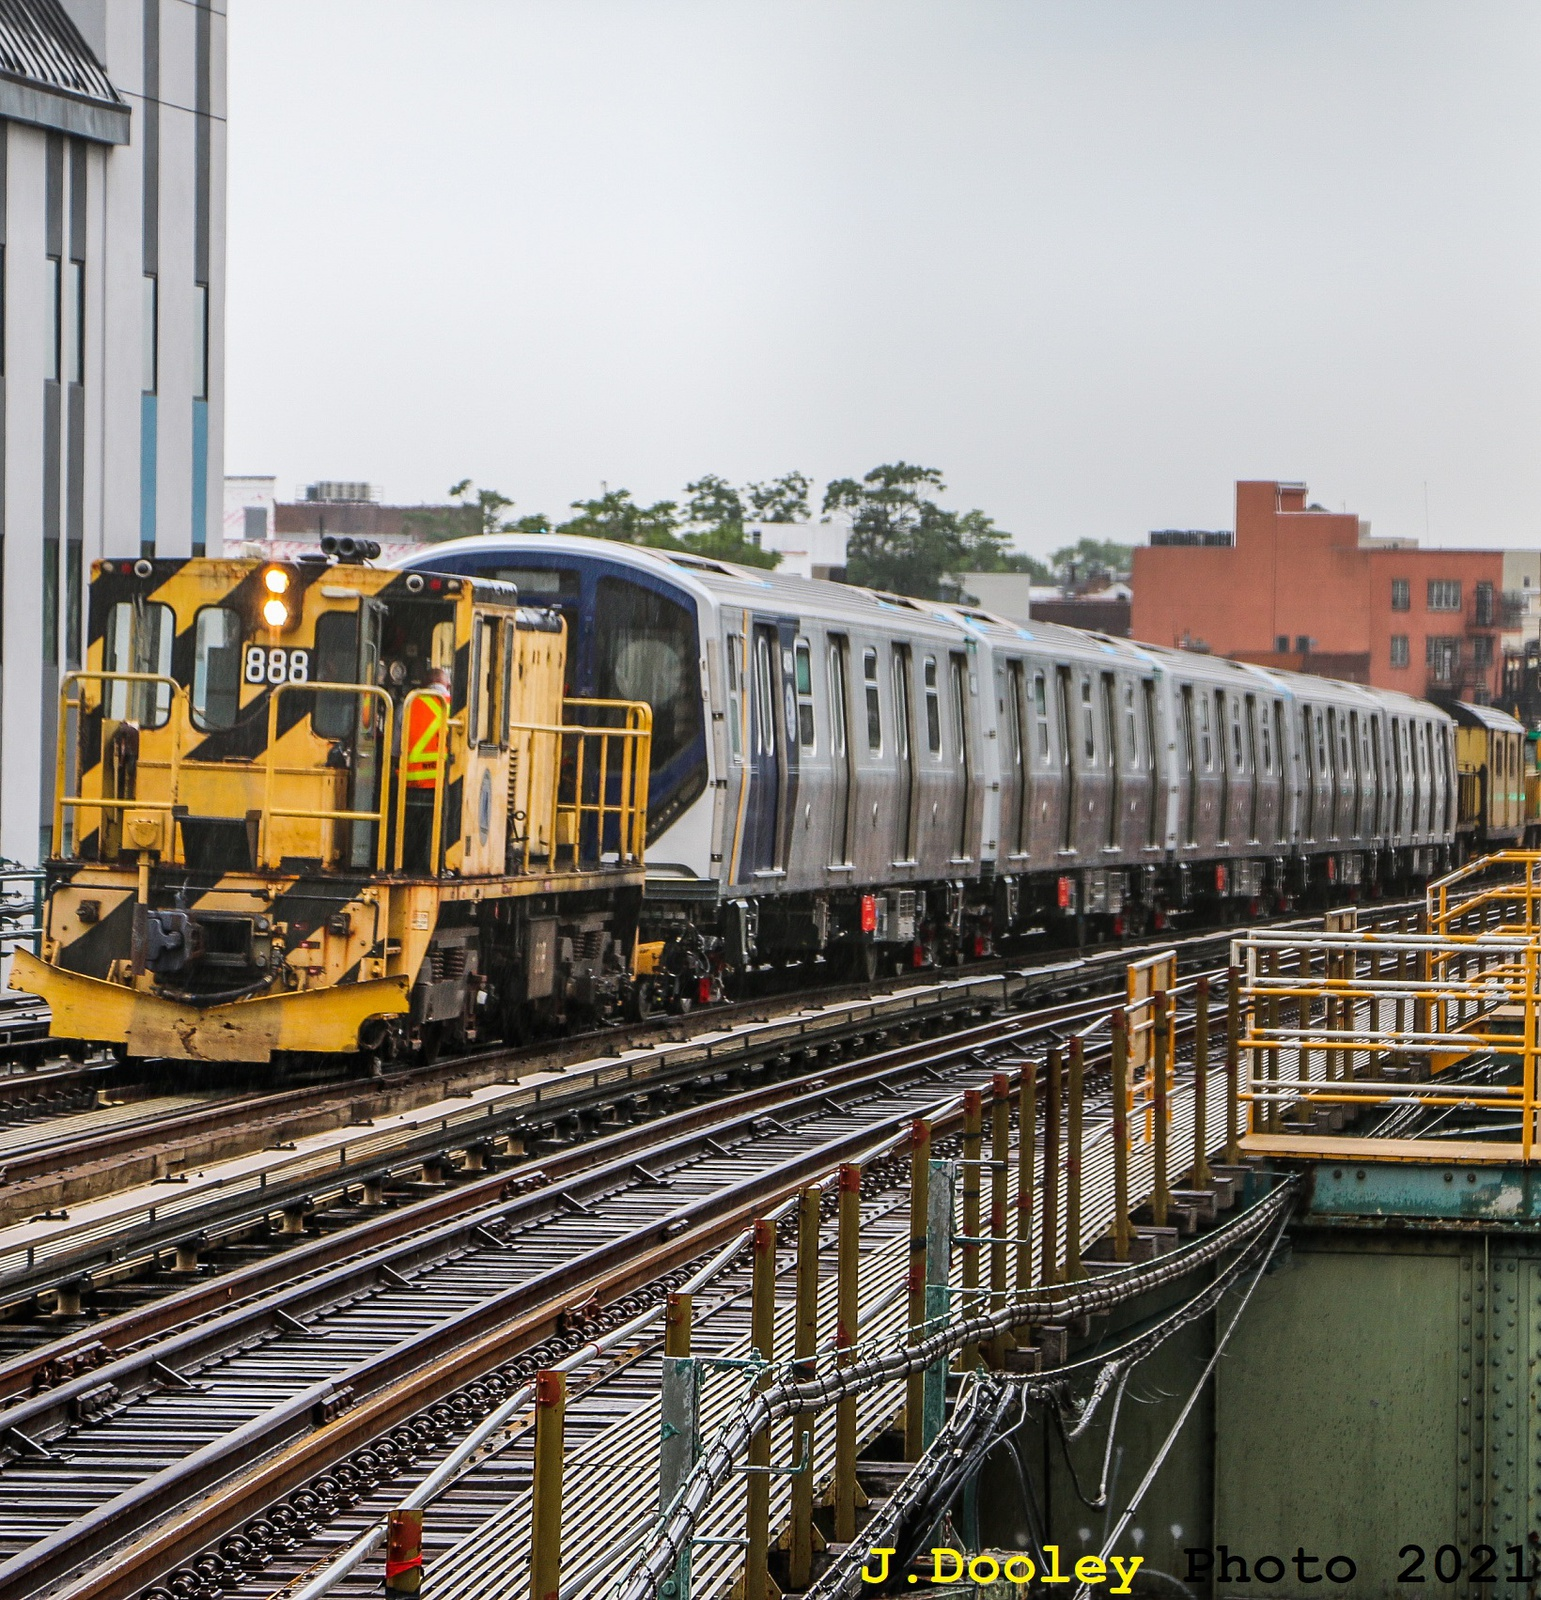 (1041k, 1541x1600)<br><b>Country:</b> United States<br><b>City:</b> New York<br><b>System:</b> New York City Transit<br><b>Line:</b> BMT West End Line<br><b>Location:</b> Fort Hamilton Parkway<br><b>Car:</b> R-77 Locomotive 888 <br><b>Photo by:</b> John Dooley<br><b>Date:</b> 7/1/2021<br><b>Notes:</b> R-211 being towed on West End Line to Coney Island.<br><b>Viewed (this week/total):</b> 4 / 237